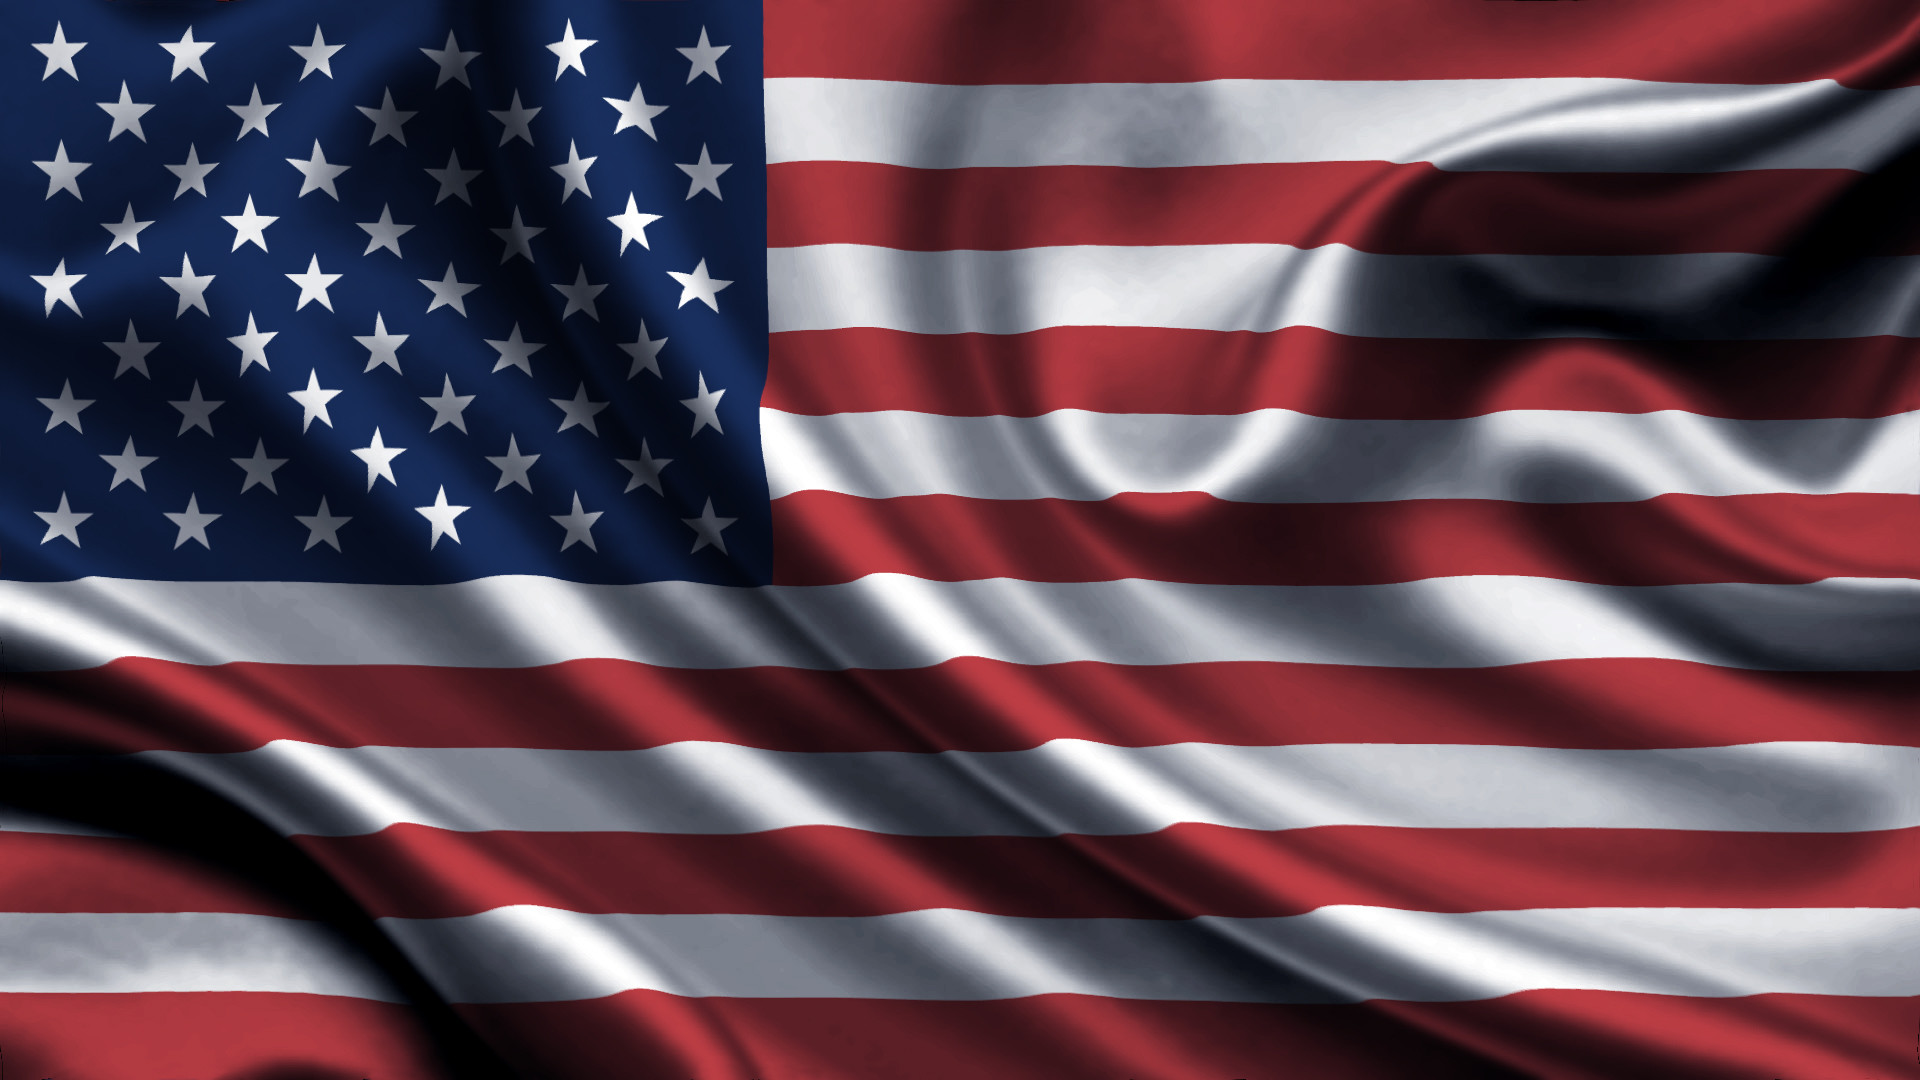 Usa Flag Wallpaper Iphone 6 Rustic American Flag Wallpaper 49 Images